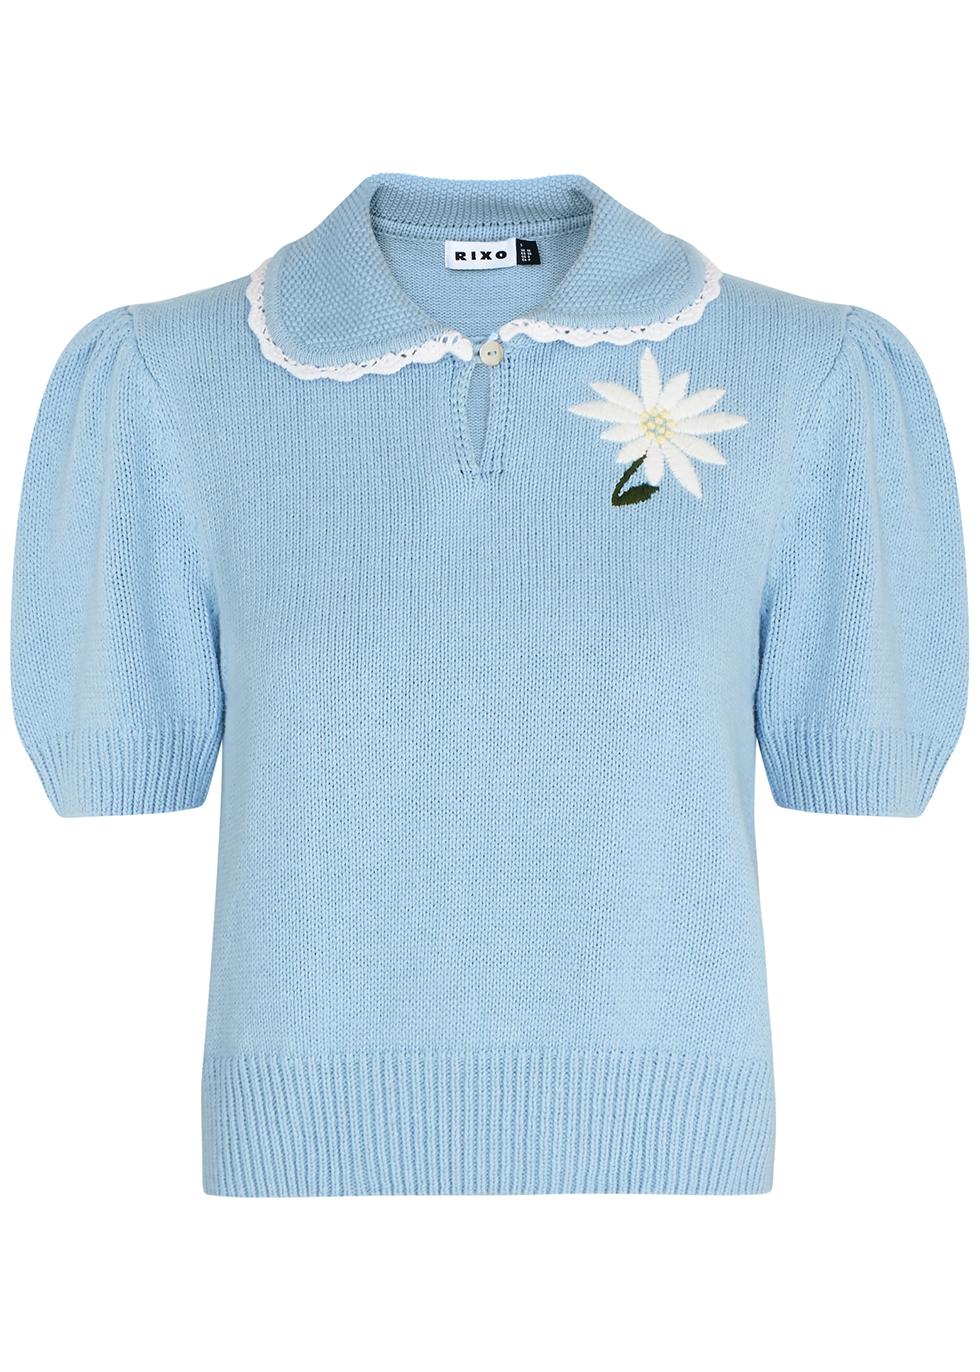 Annalise blue knitted jumper